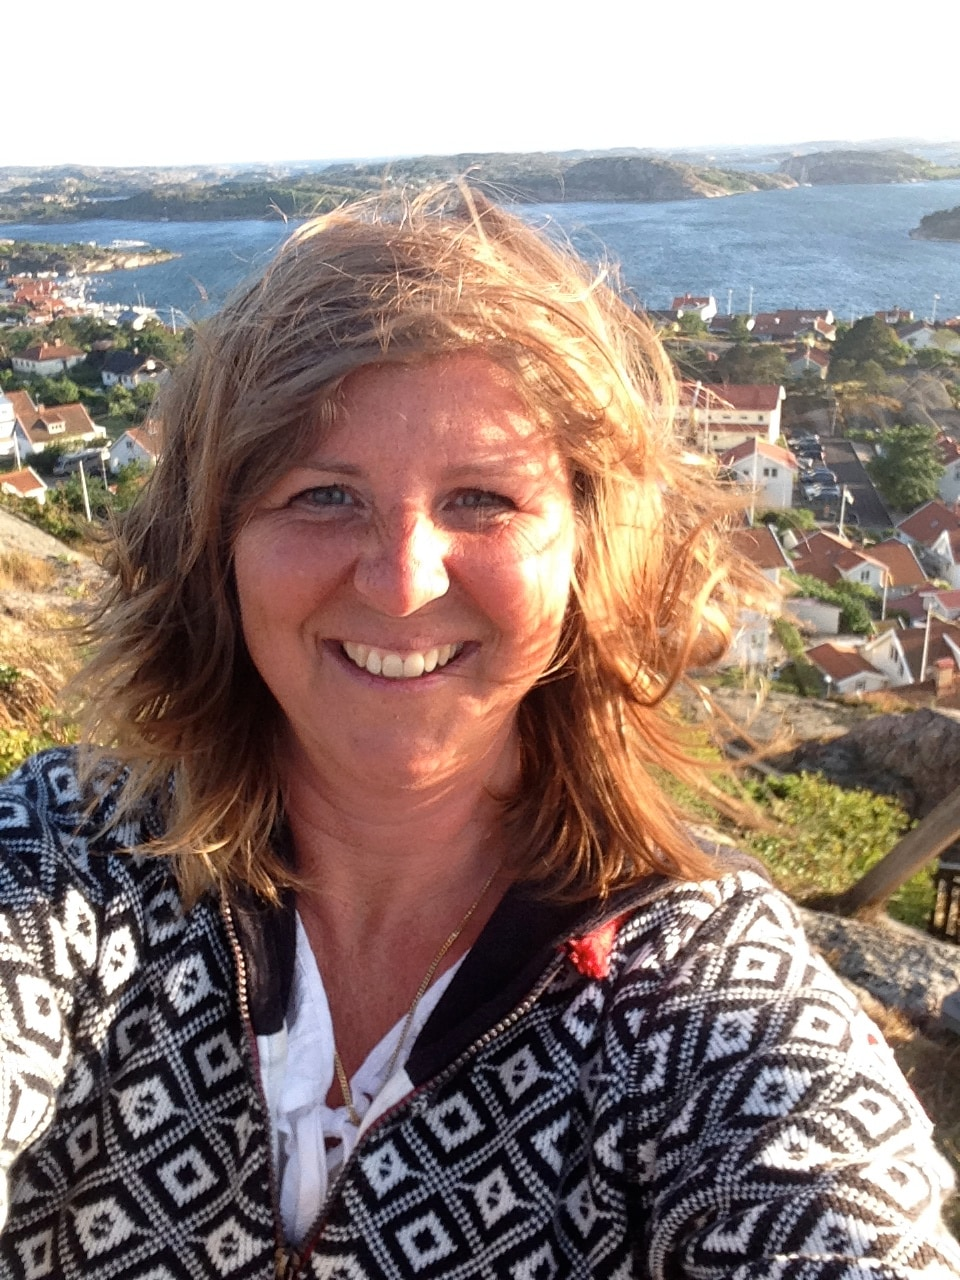 Susie from Vallentuna